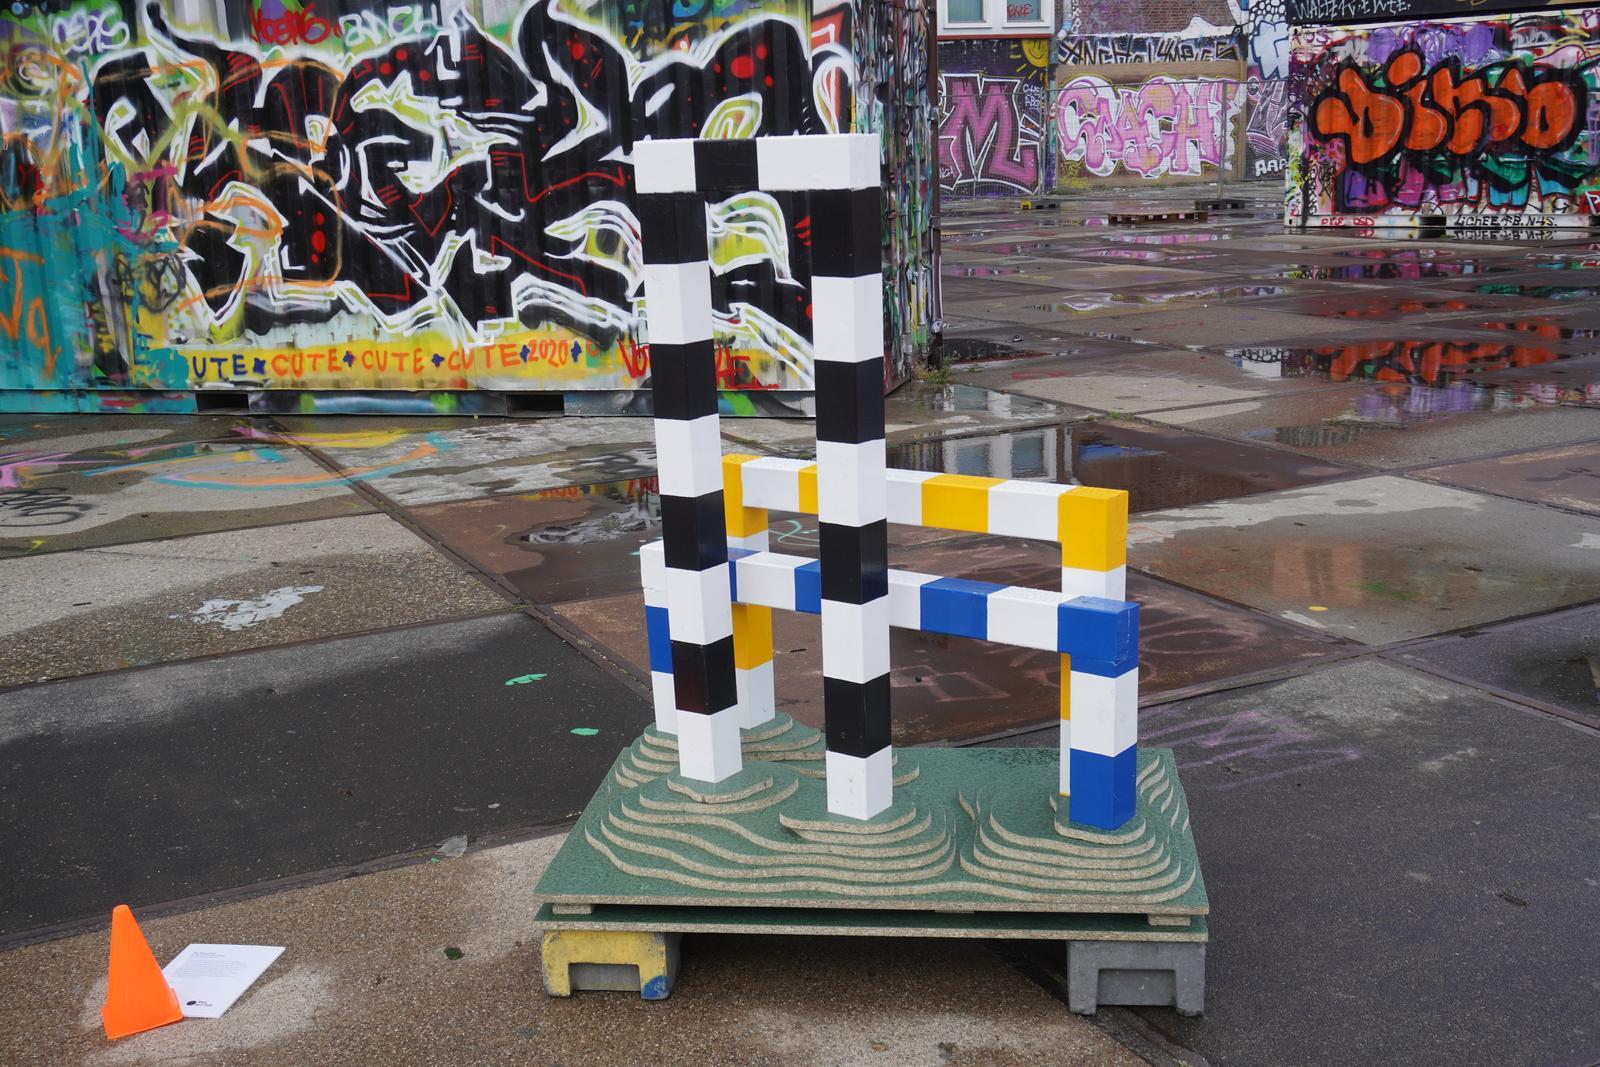 Pip Passchier - Hurdles in rest position (2020)